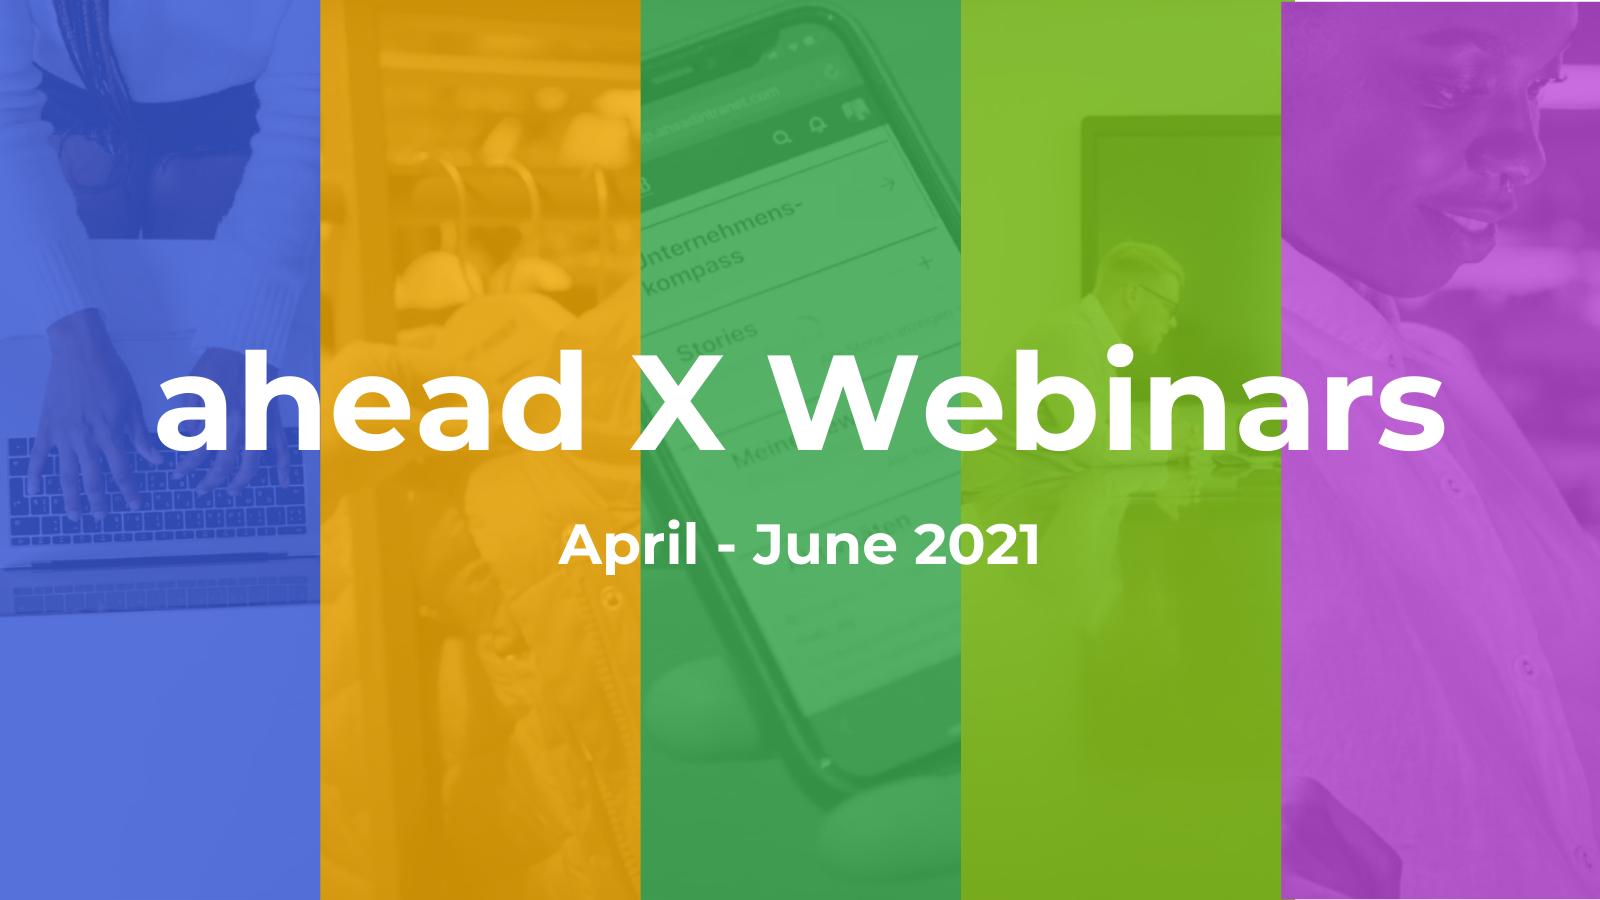 New series of ahead X Webinars!